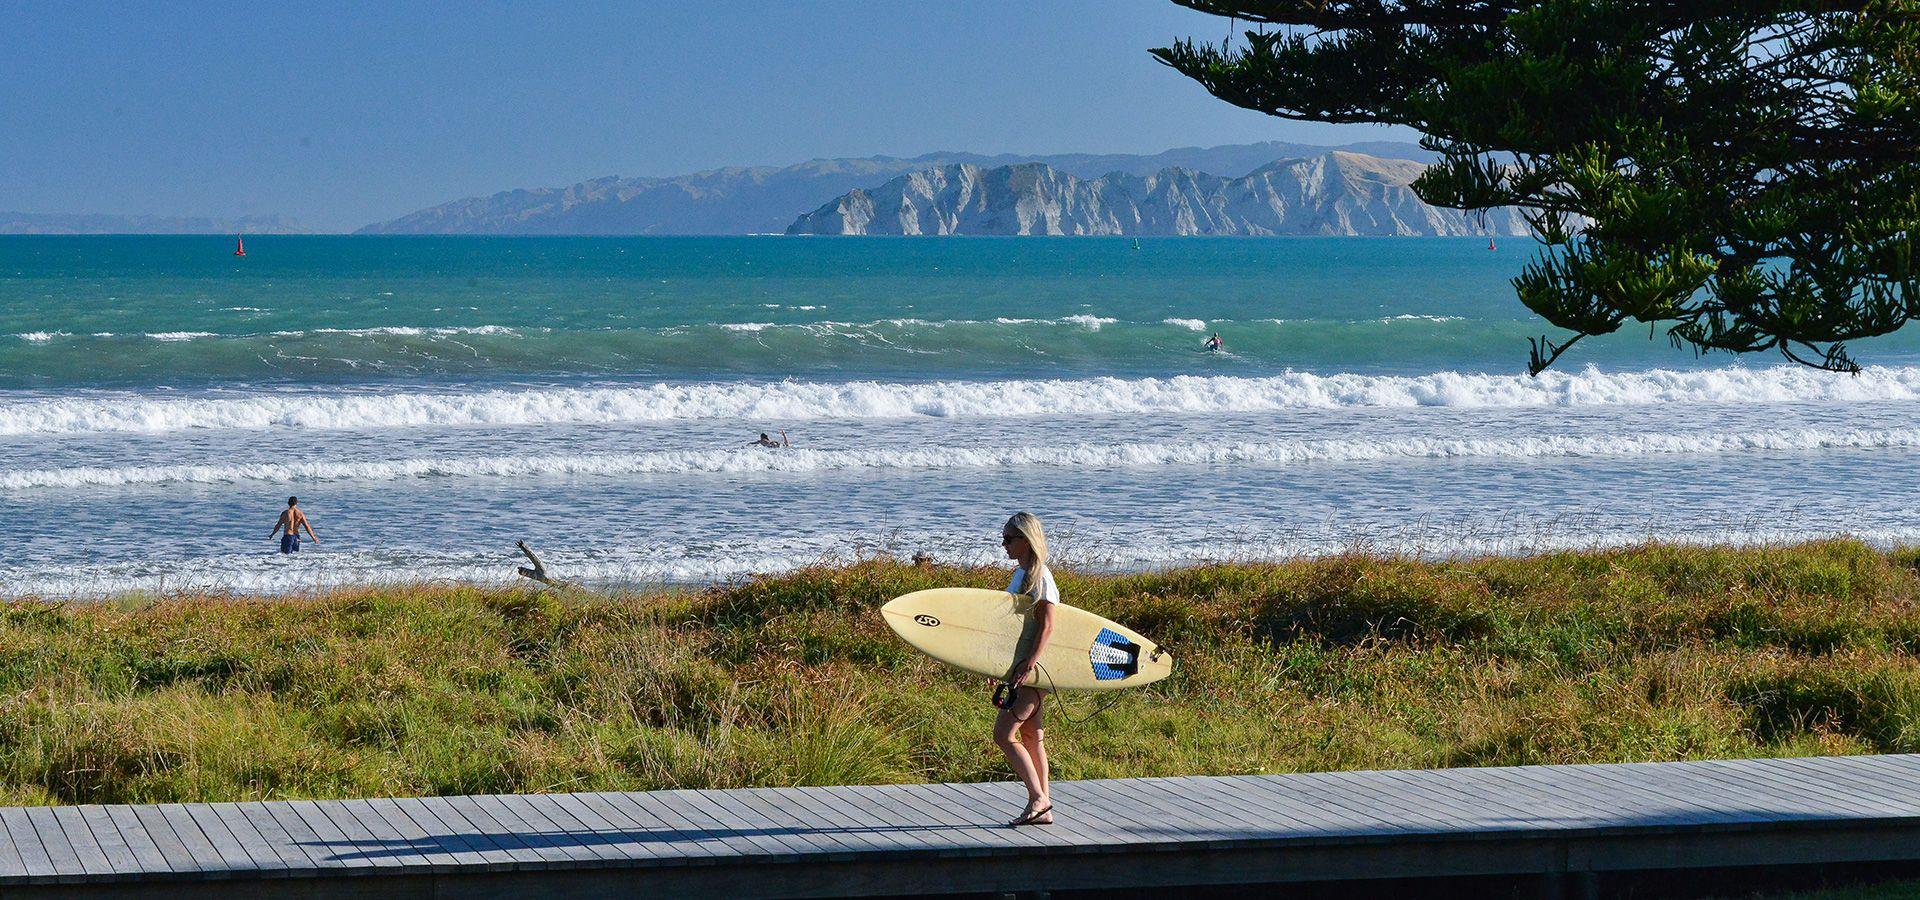 Gisborne surfing